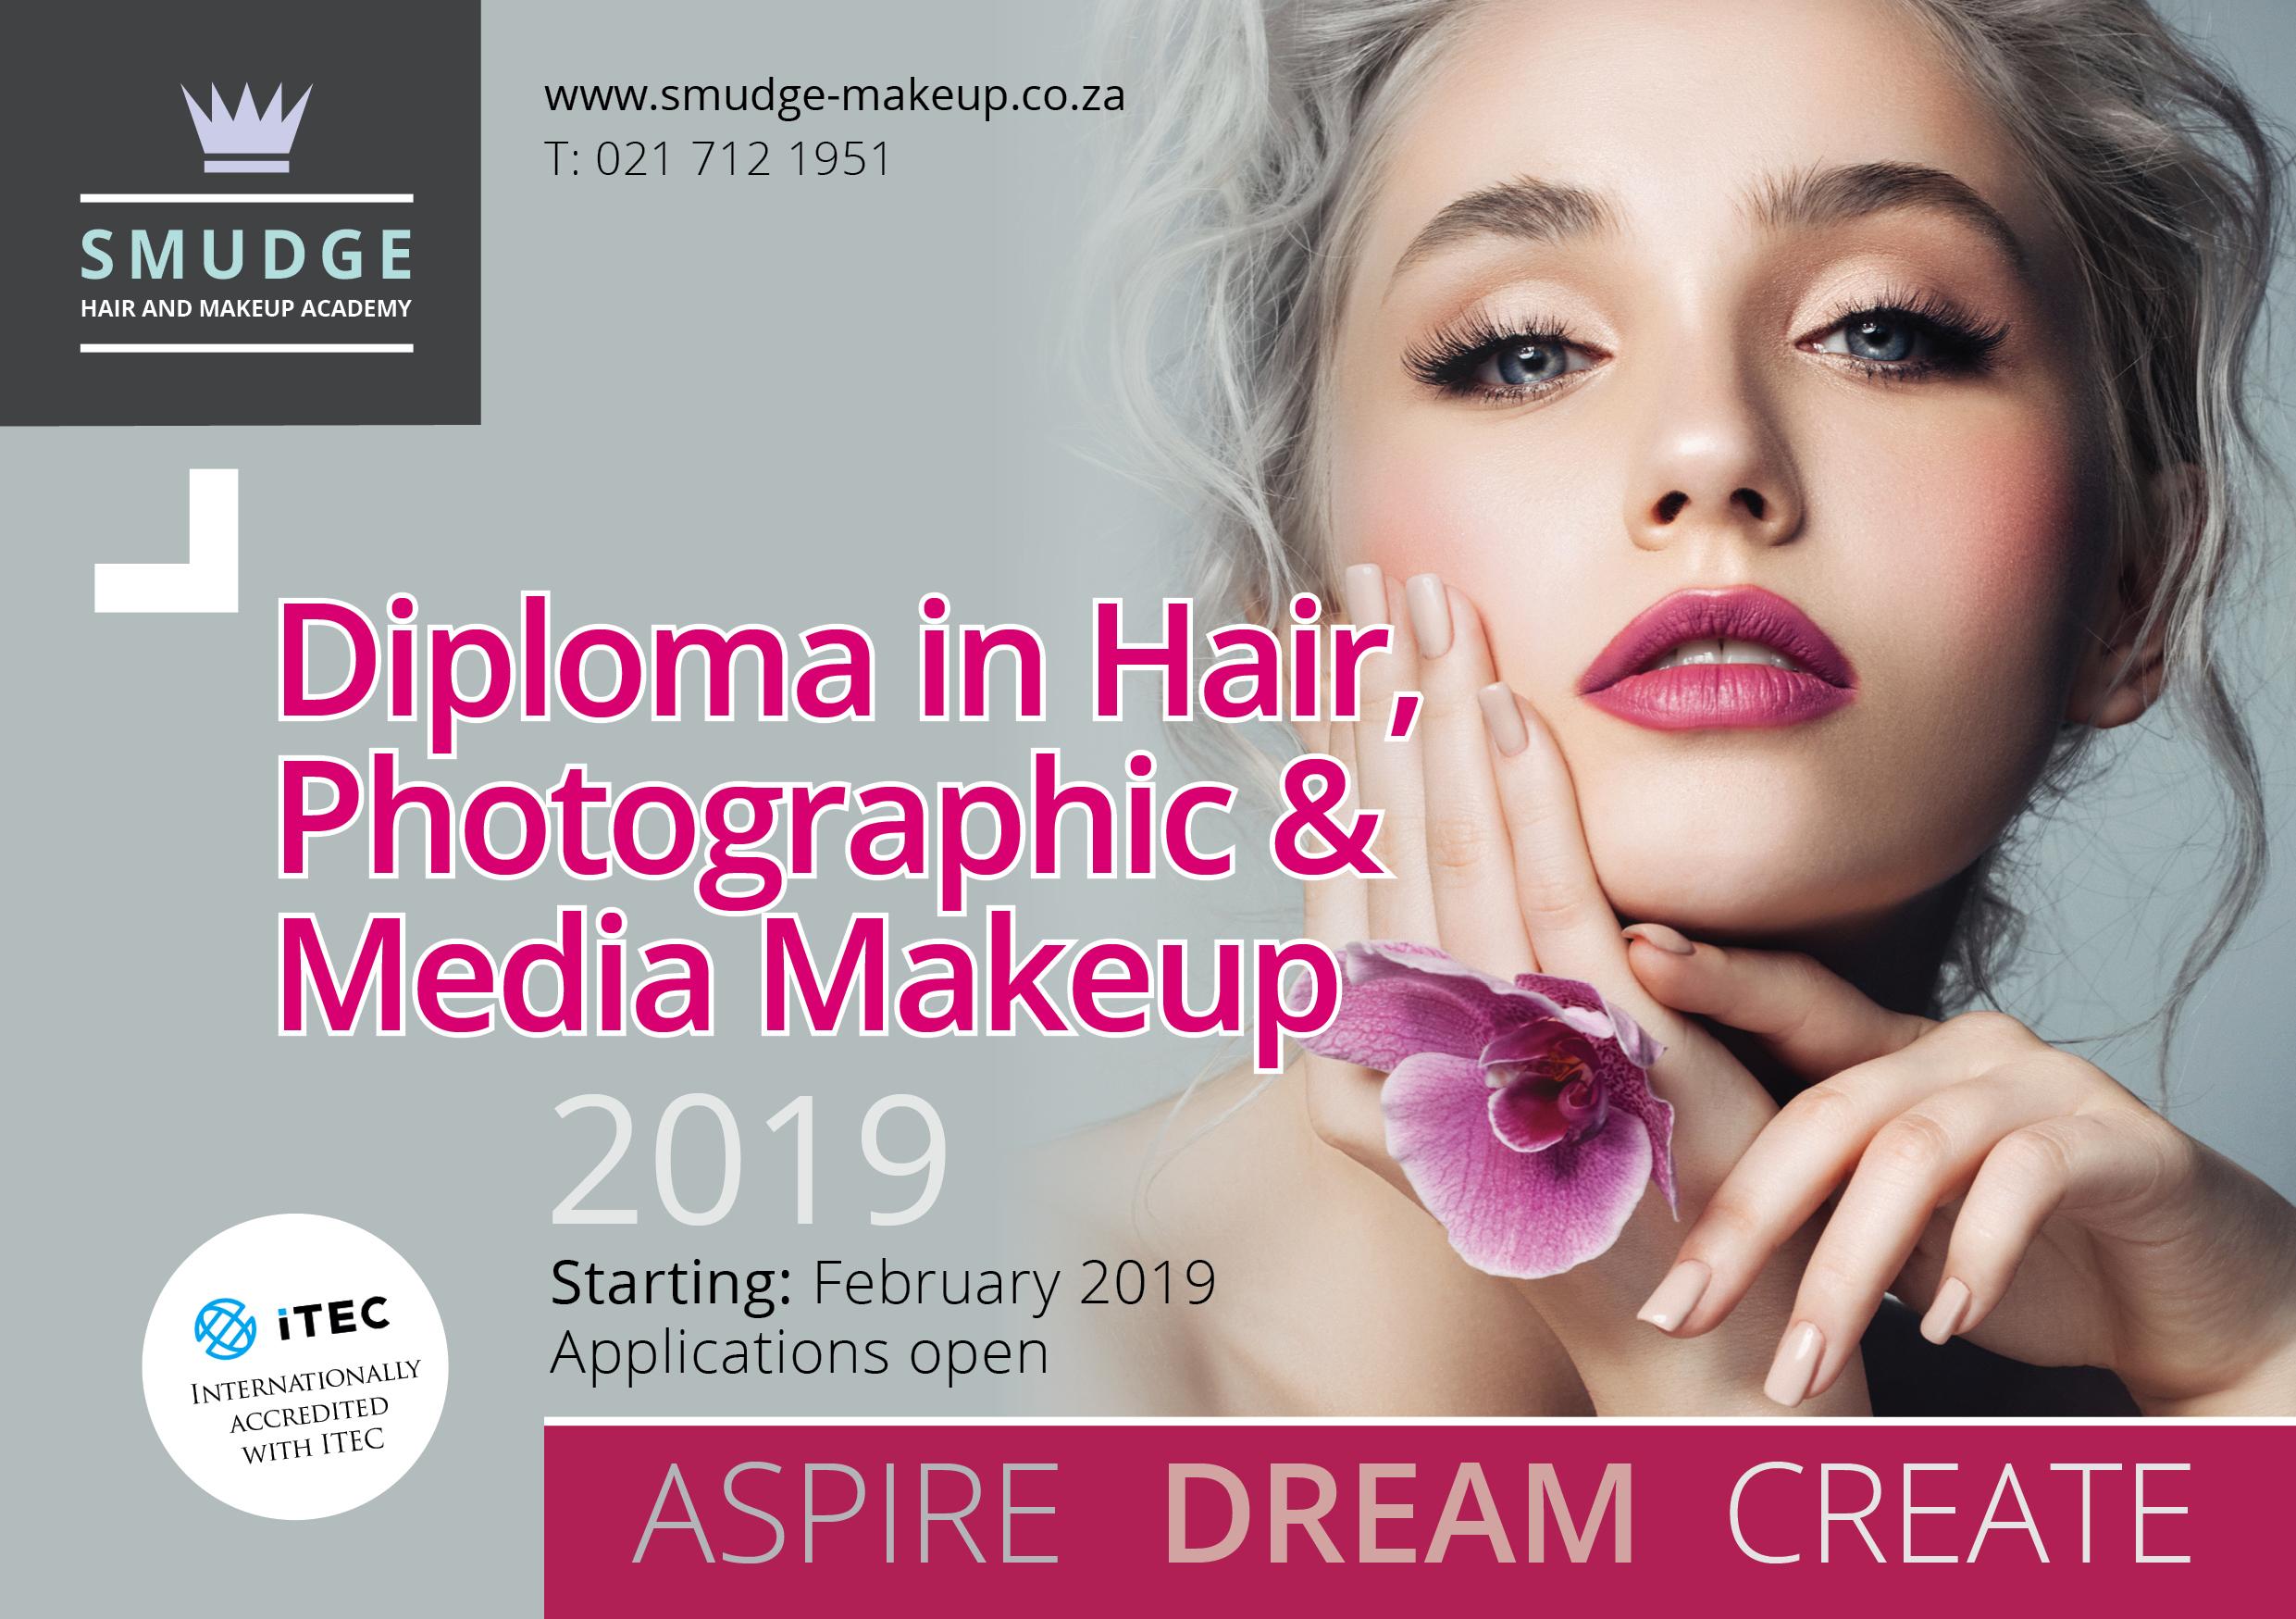 Smudge flyers - Hair & Media Makeup.jpg